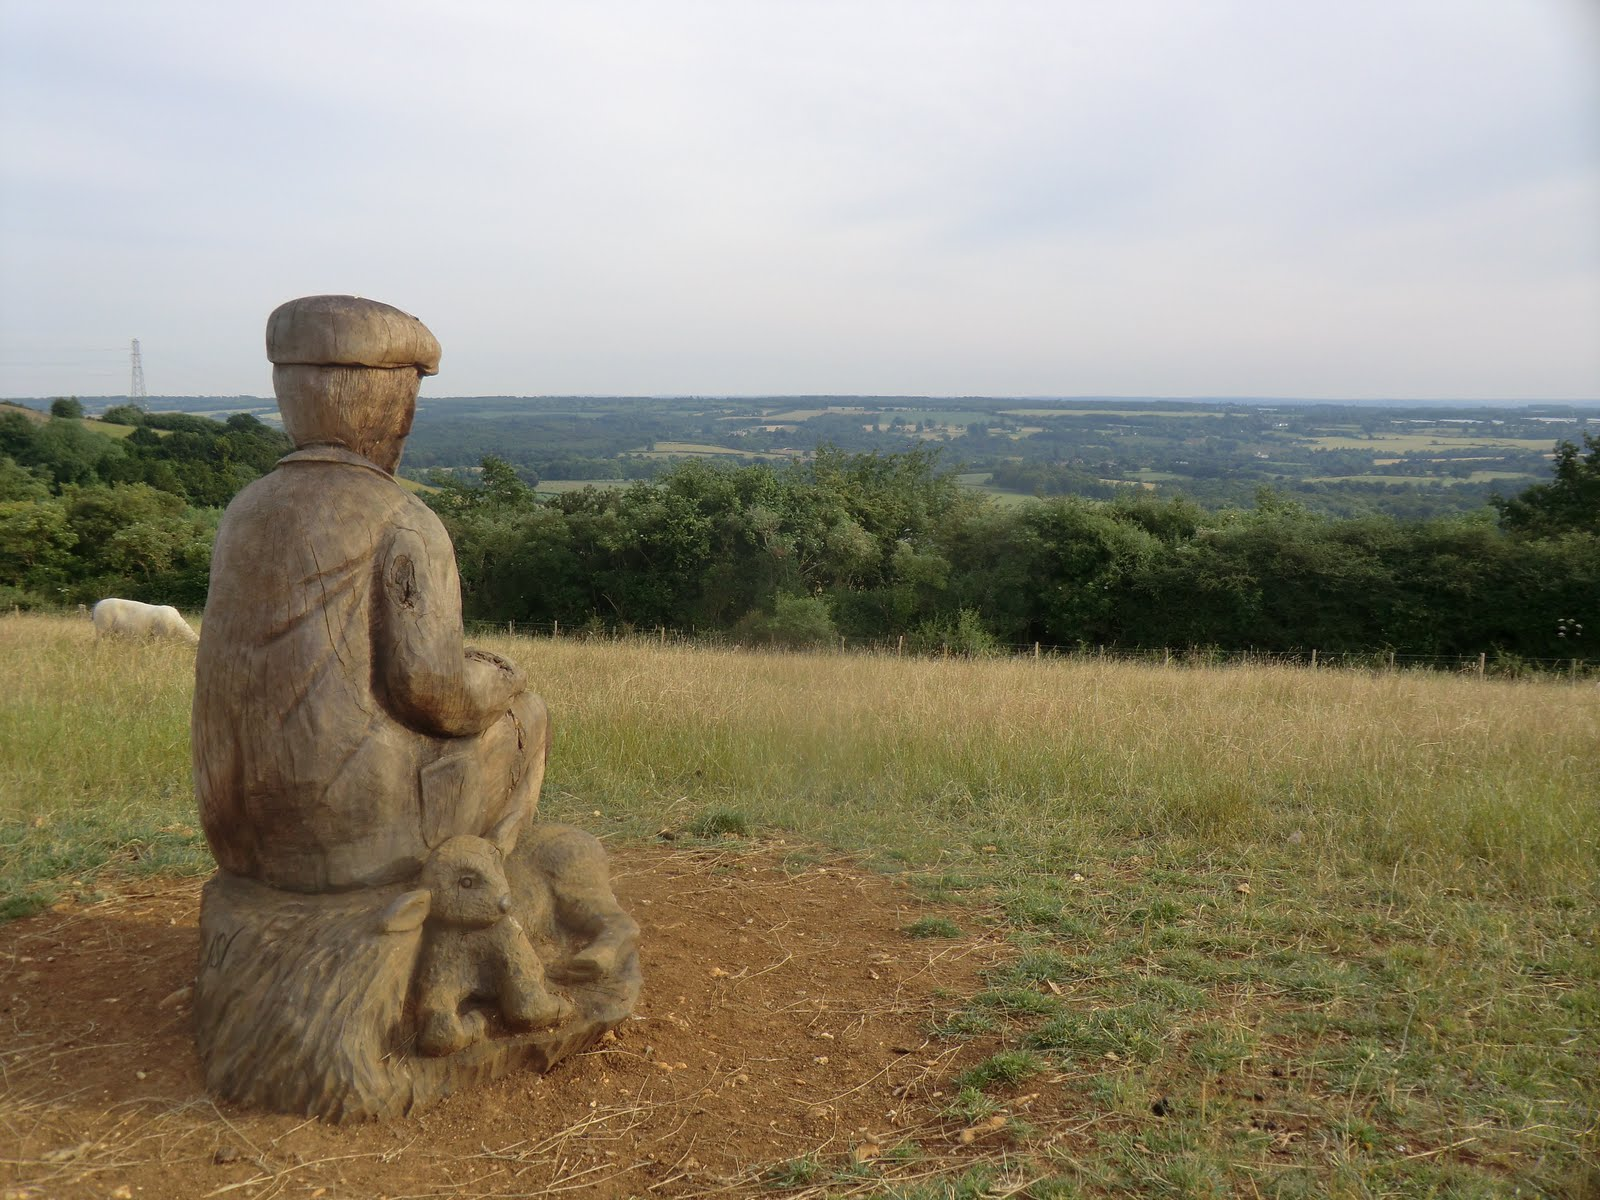 CIMG2464 The Shepherd admires the view